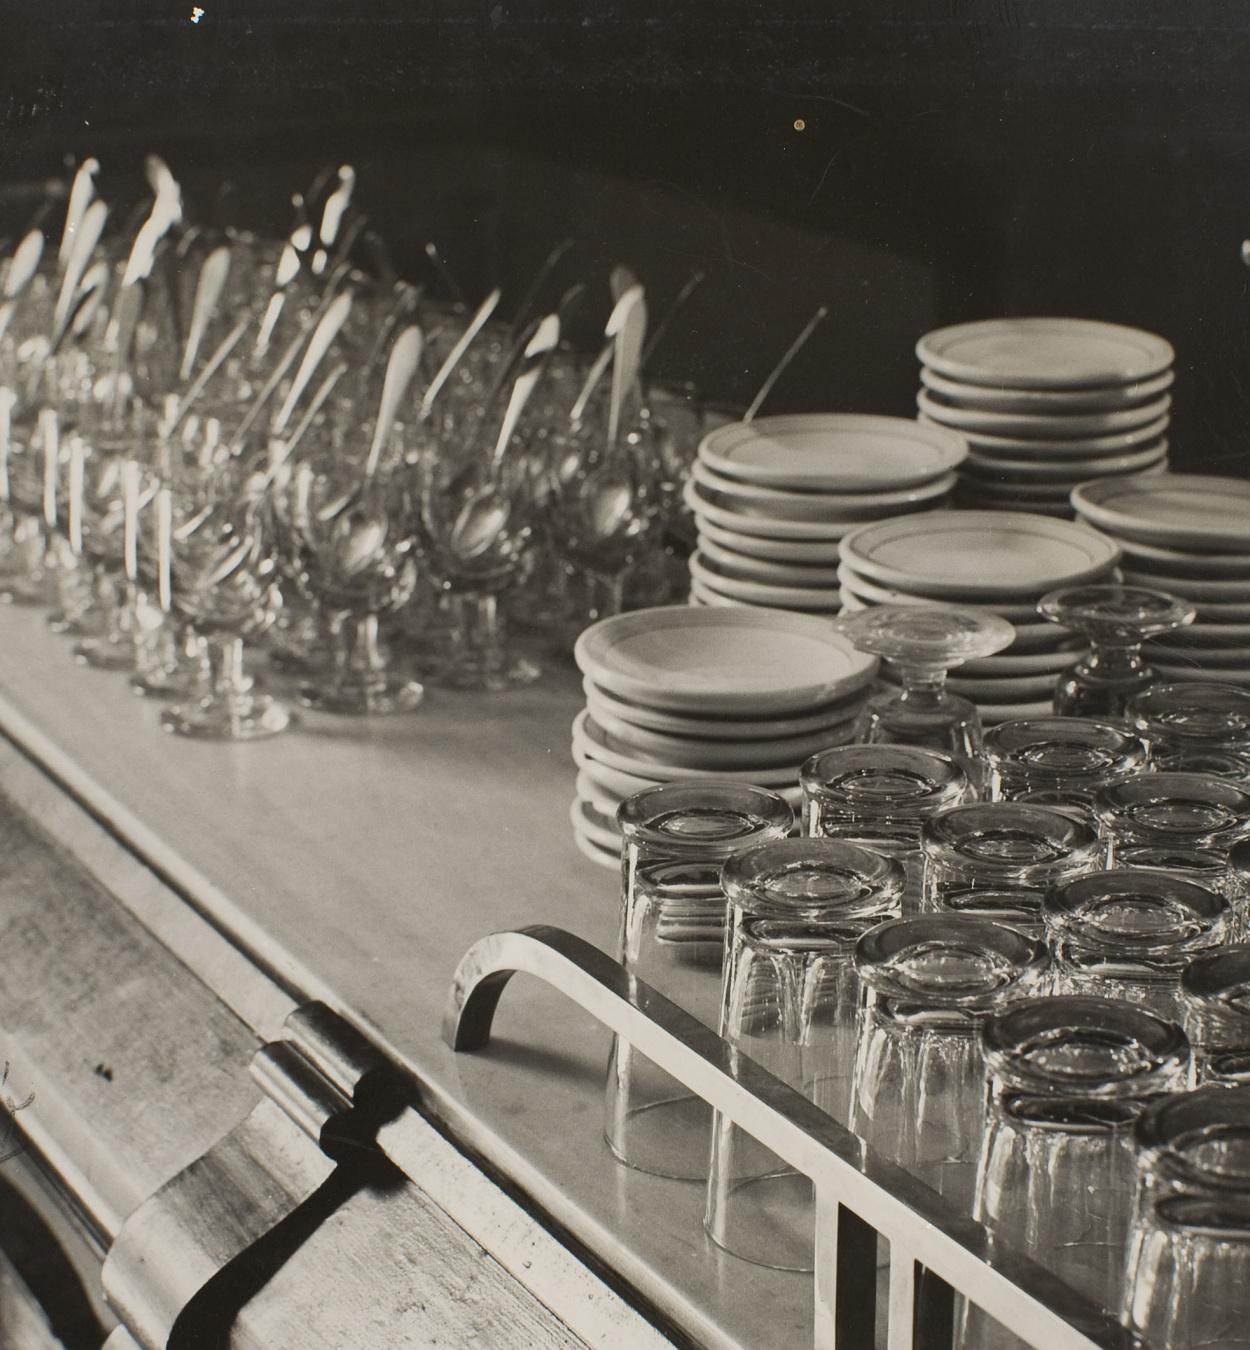 Josep Maria Lladó - Glassware - Circa 1932